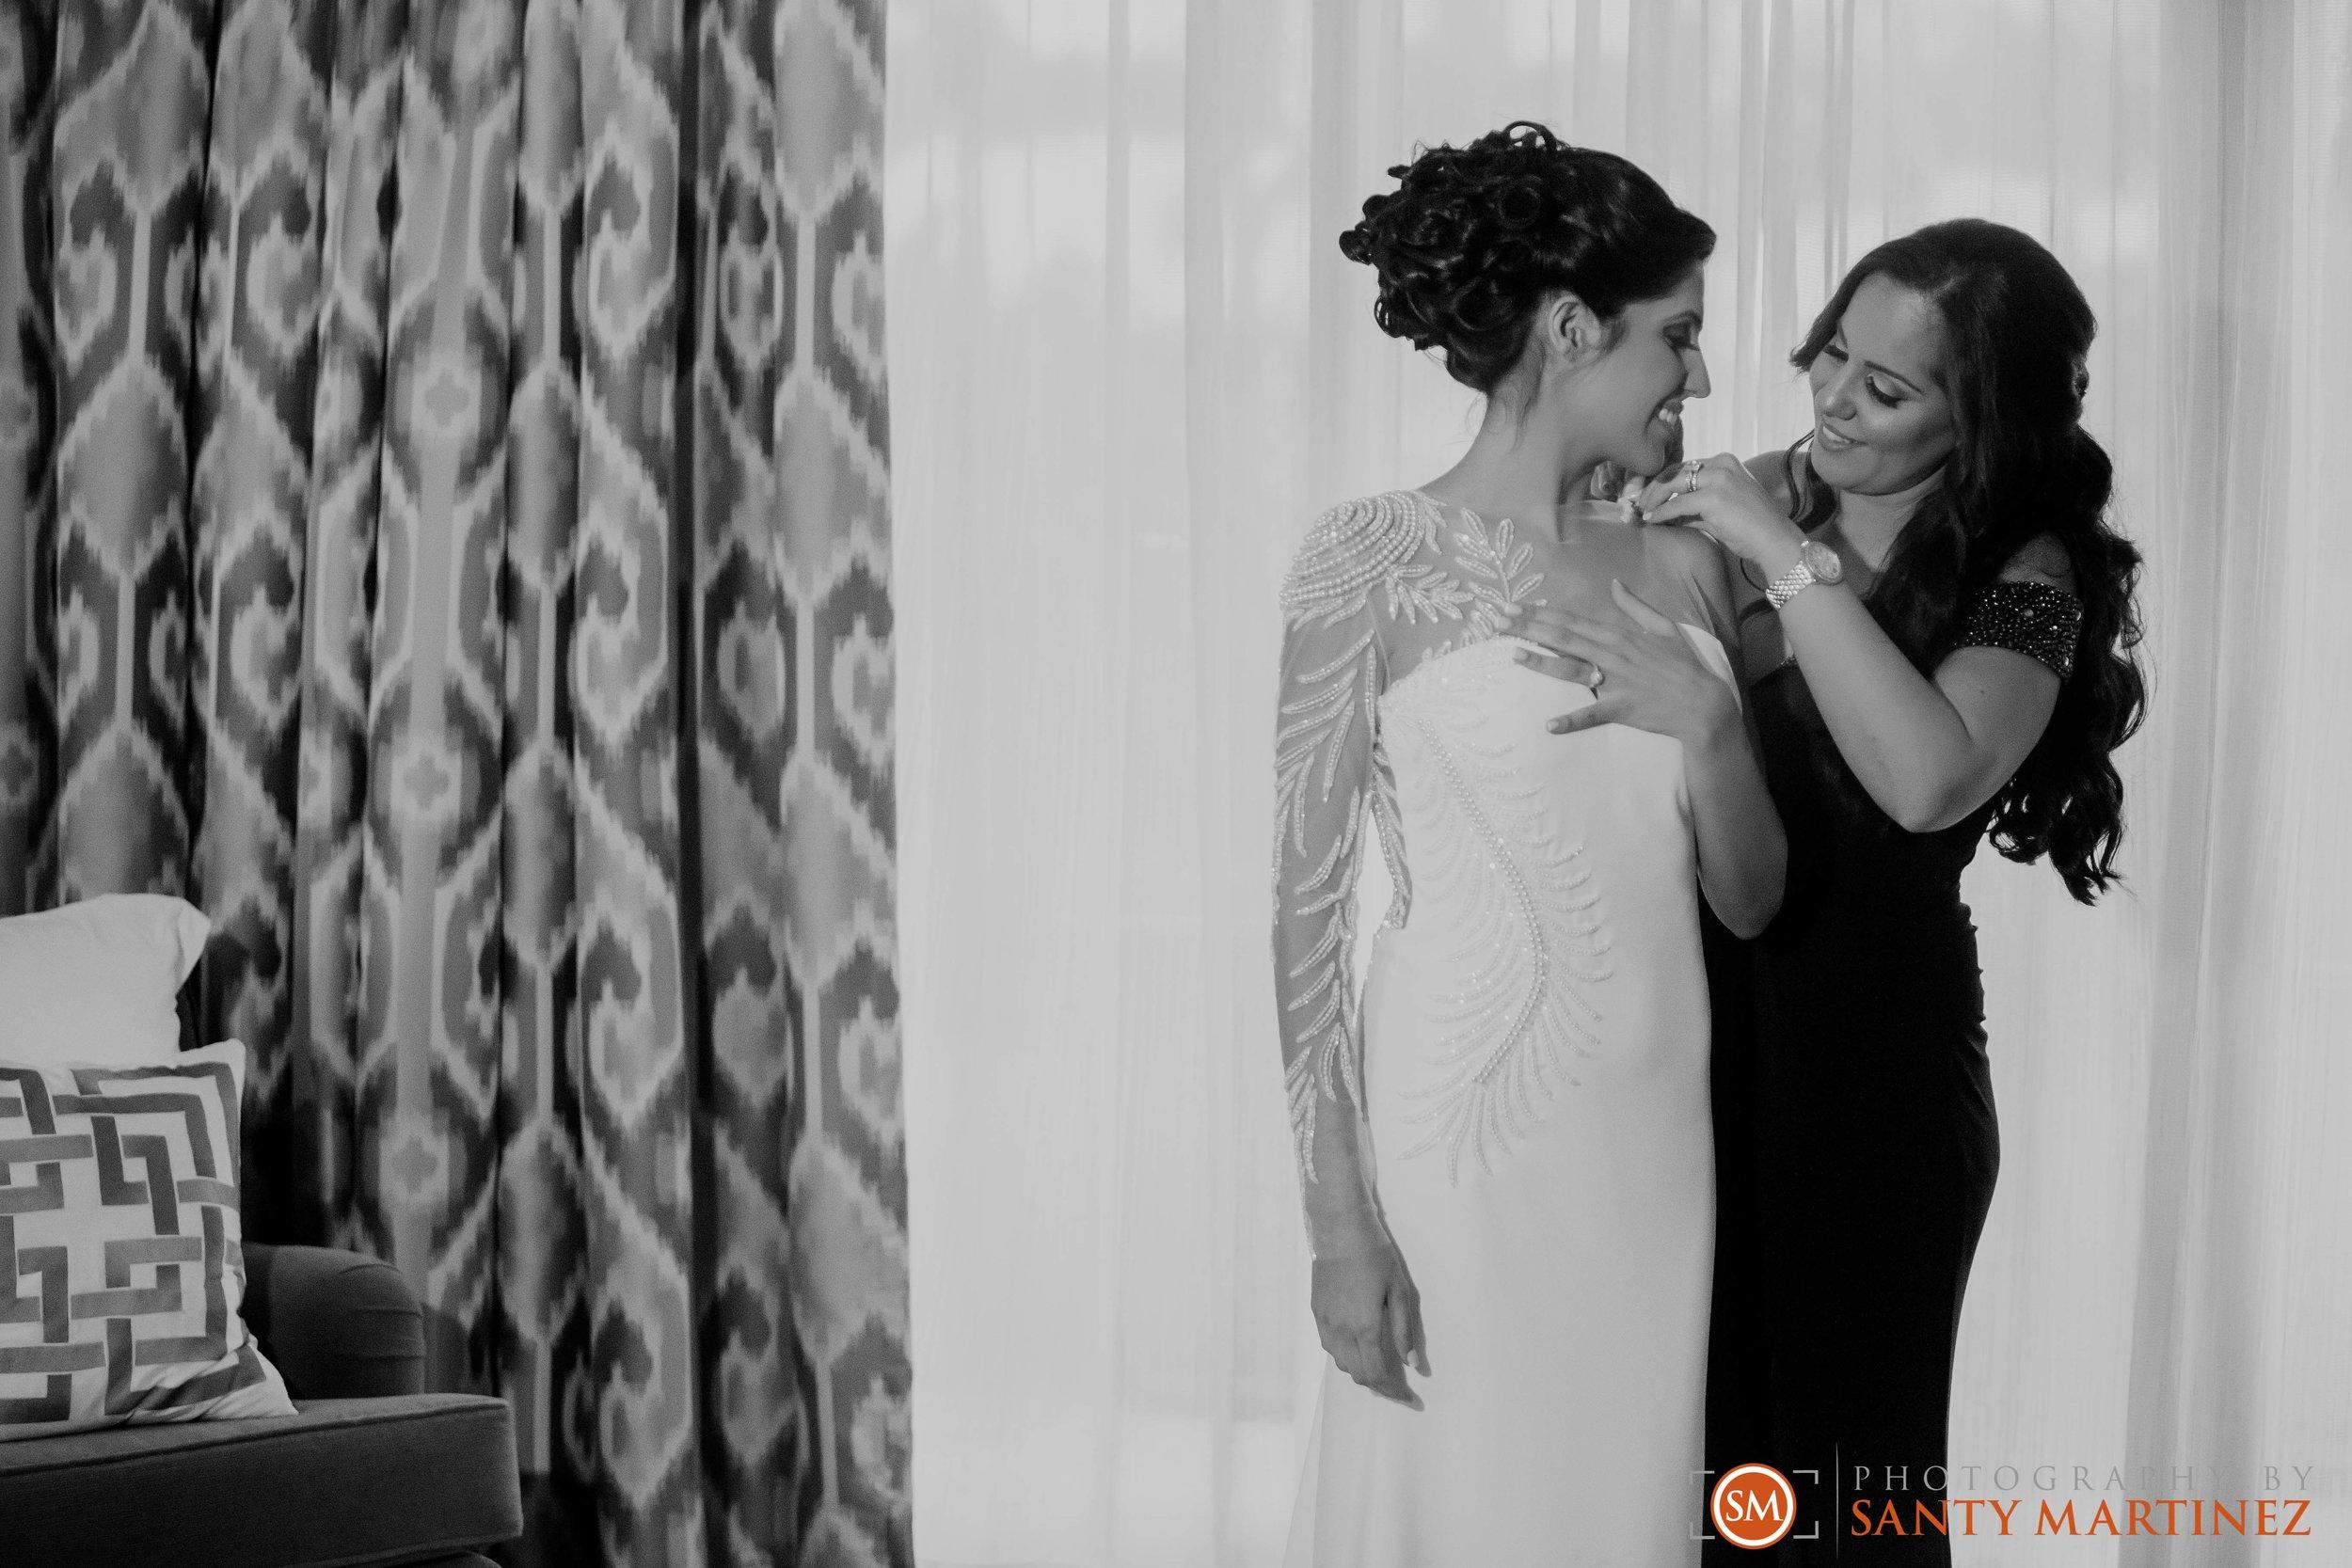 Wedding Trump National Doral Miami - Photography by Santy Martinez-8.jpg